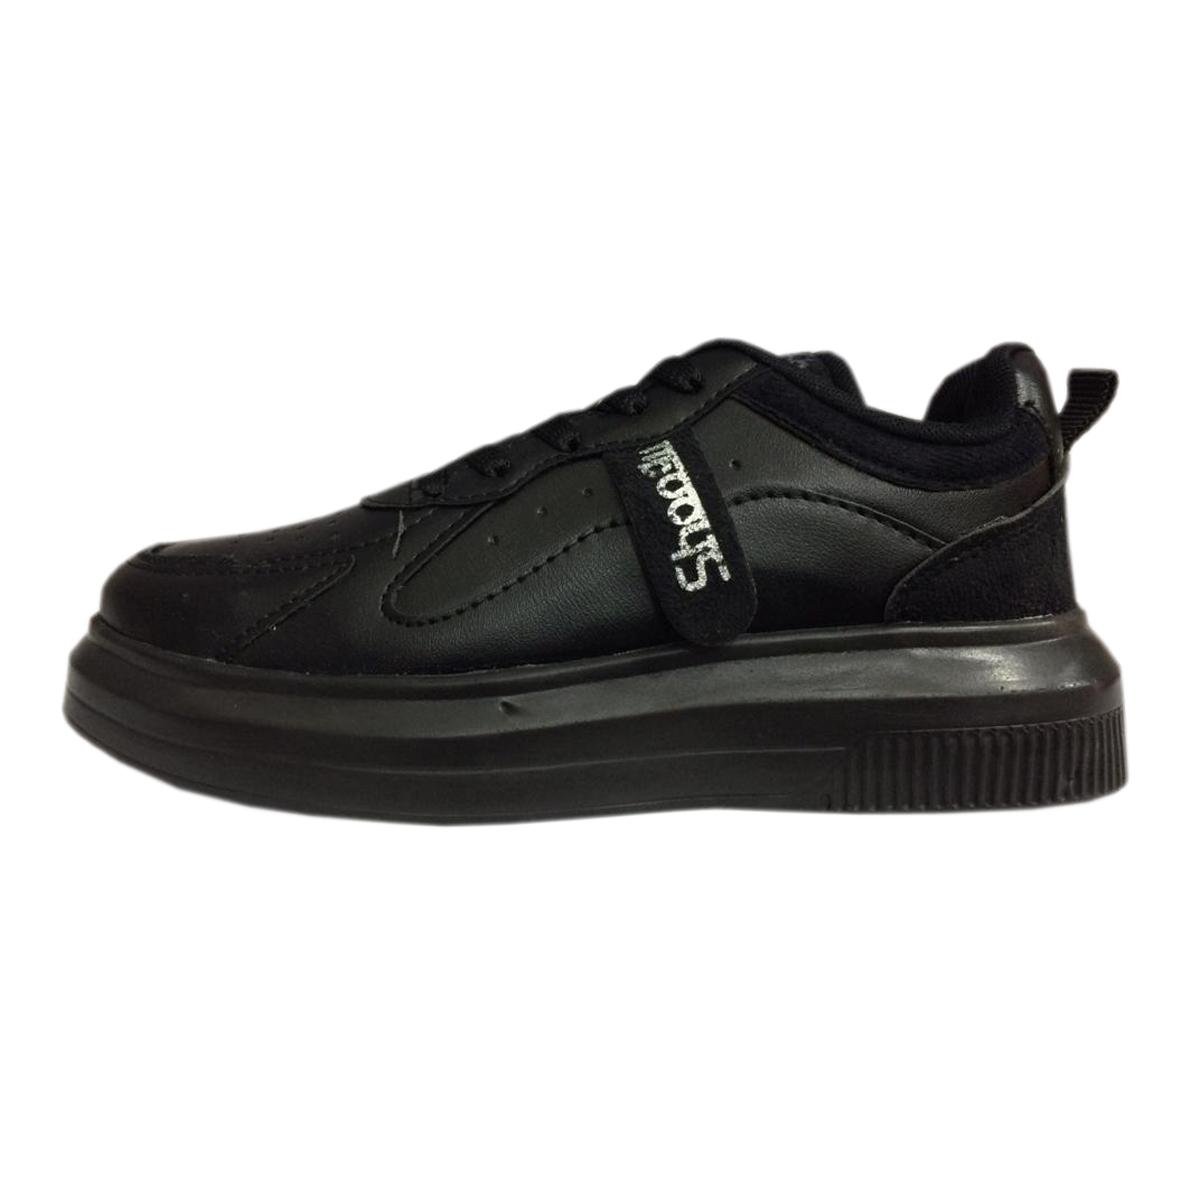 کفش راحتی مدل OPL-201